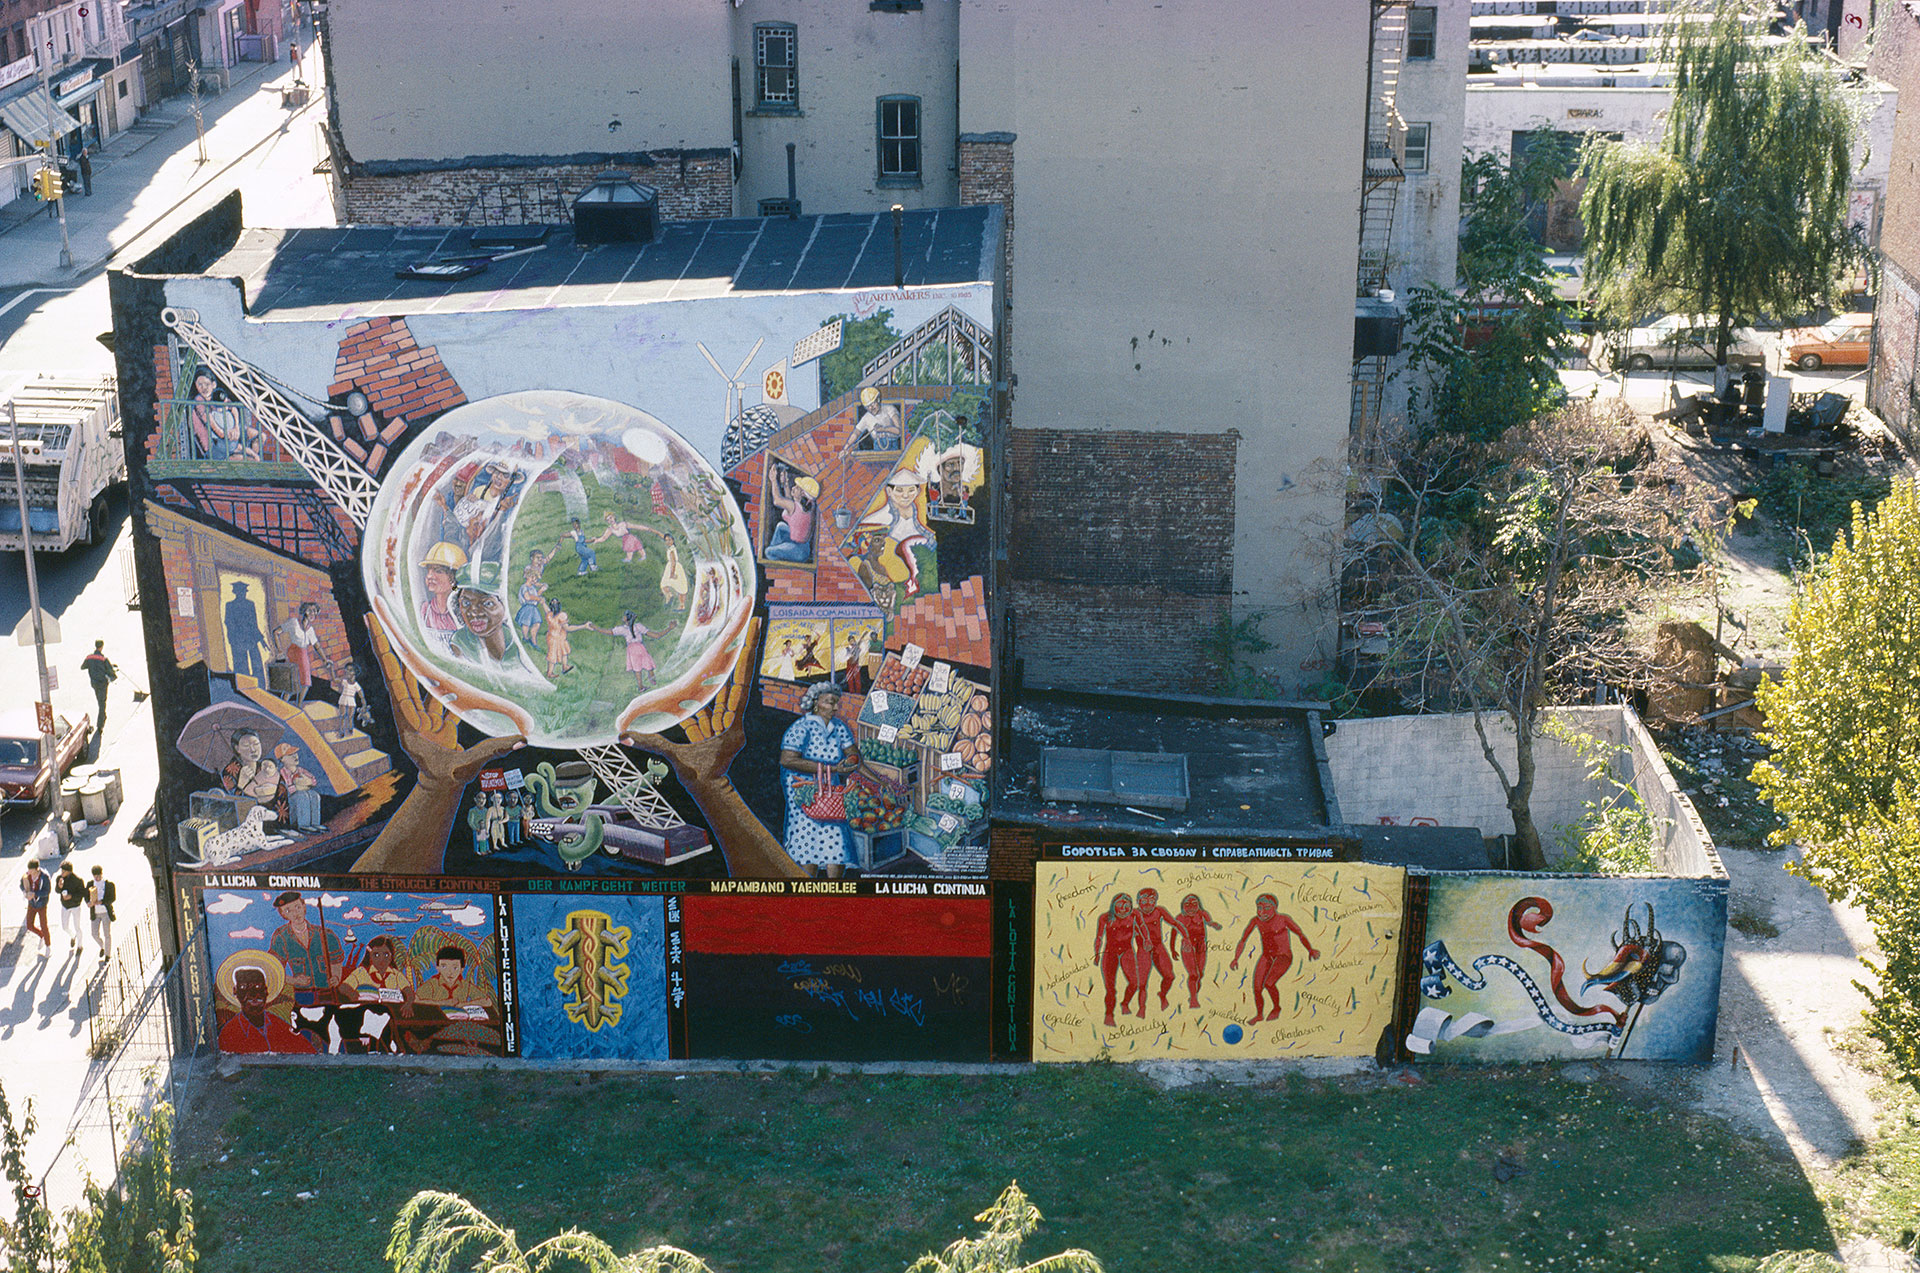 Above:  La Lucha Continua The Struggle Continues  collective mural. Below: individual murals by Karin Batten, Keith Christensen, Cliff Joseph, Camille Perrottet and Maria Dominguez  Photo © Estate of Eva Cockcroft